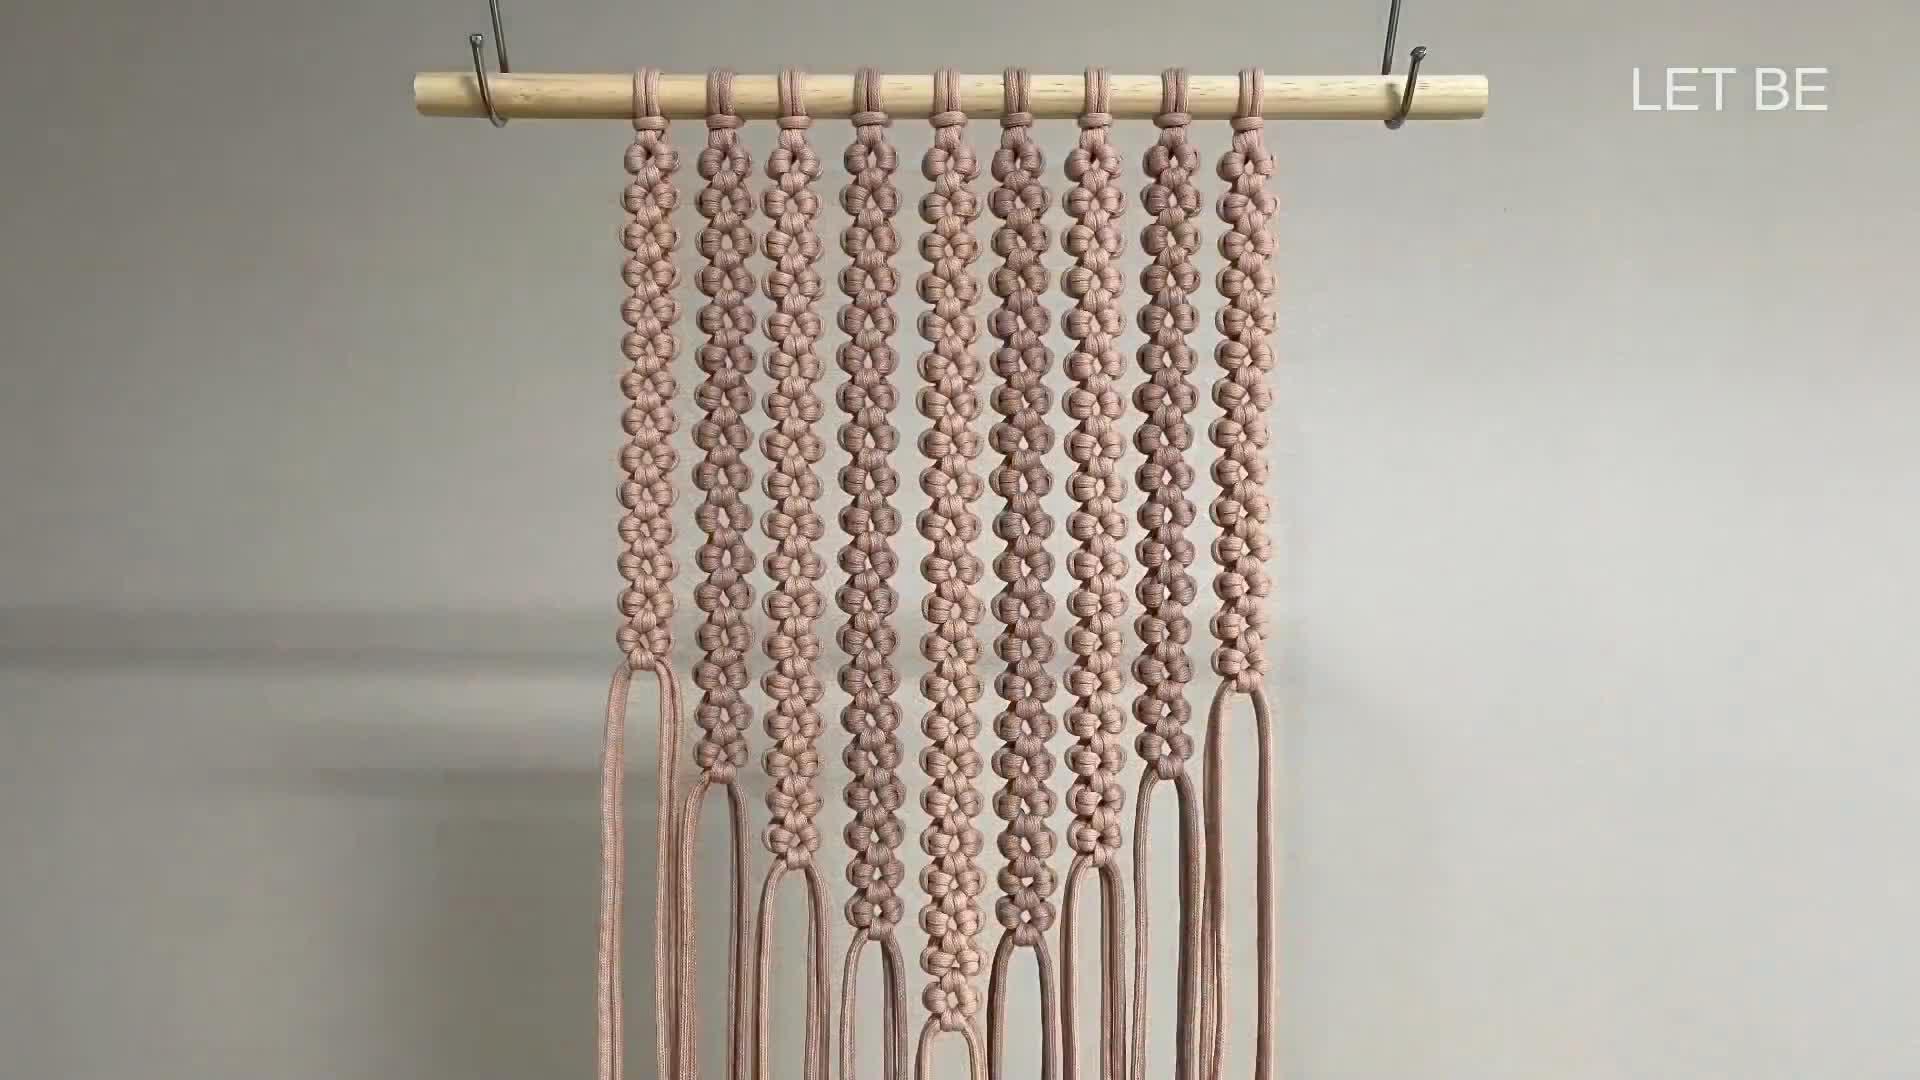 DIY手工编织墙挂视频教程|DIY macrame wall hanging